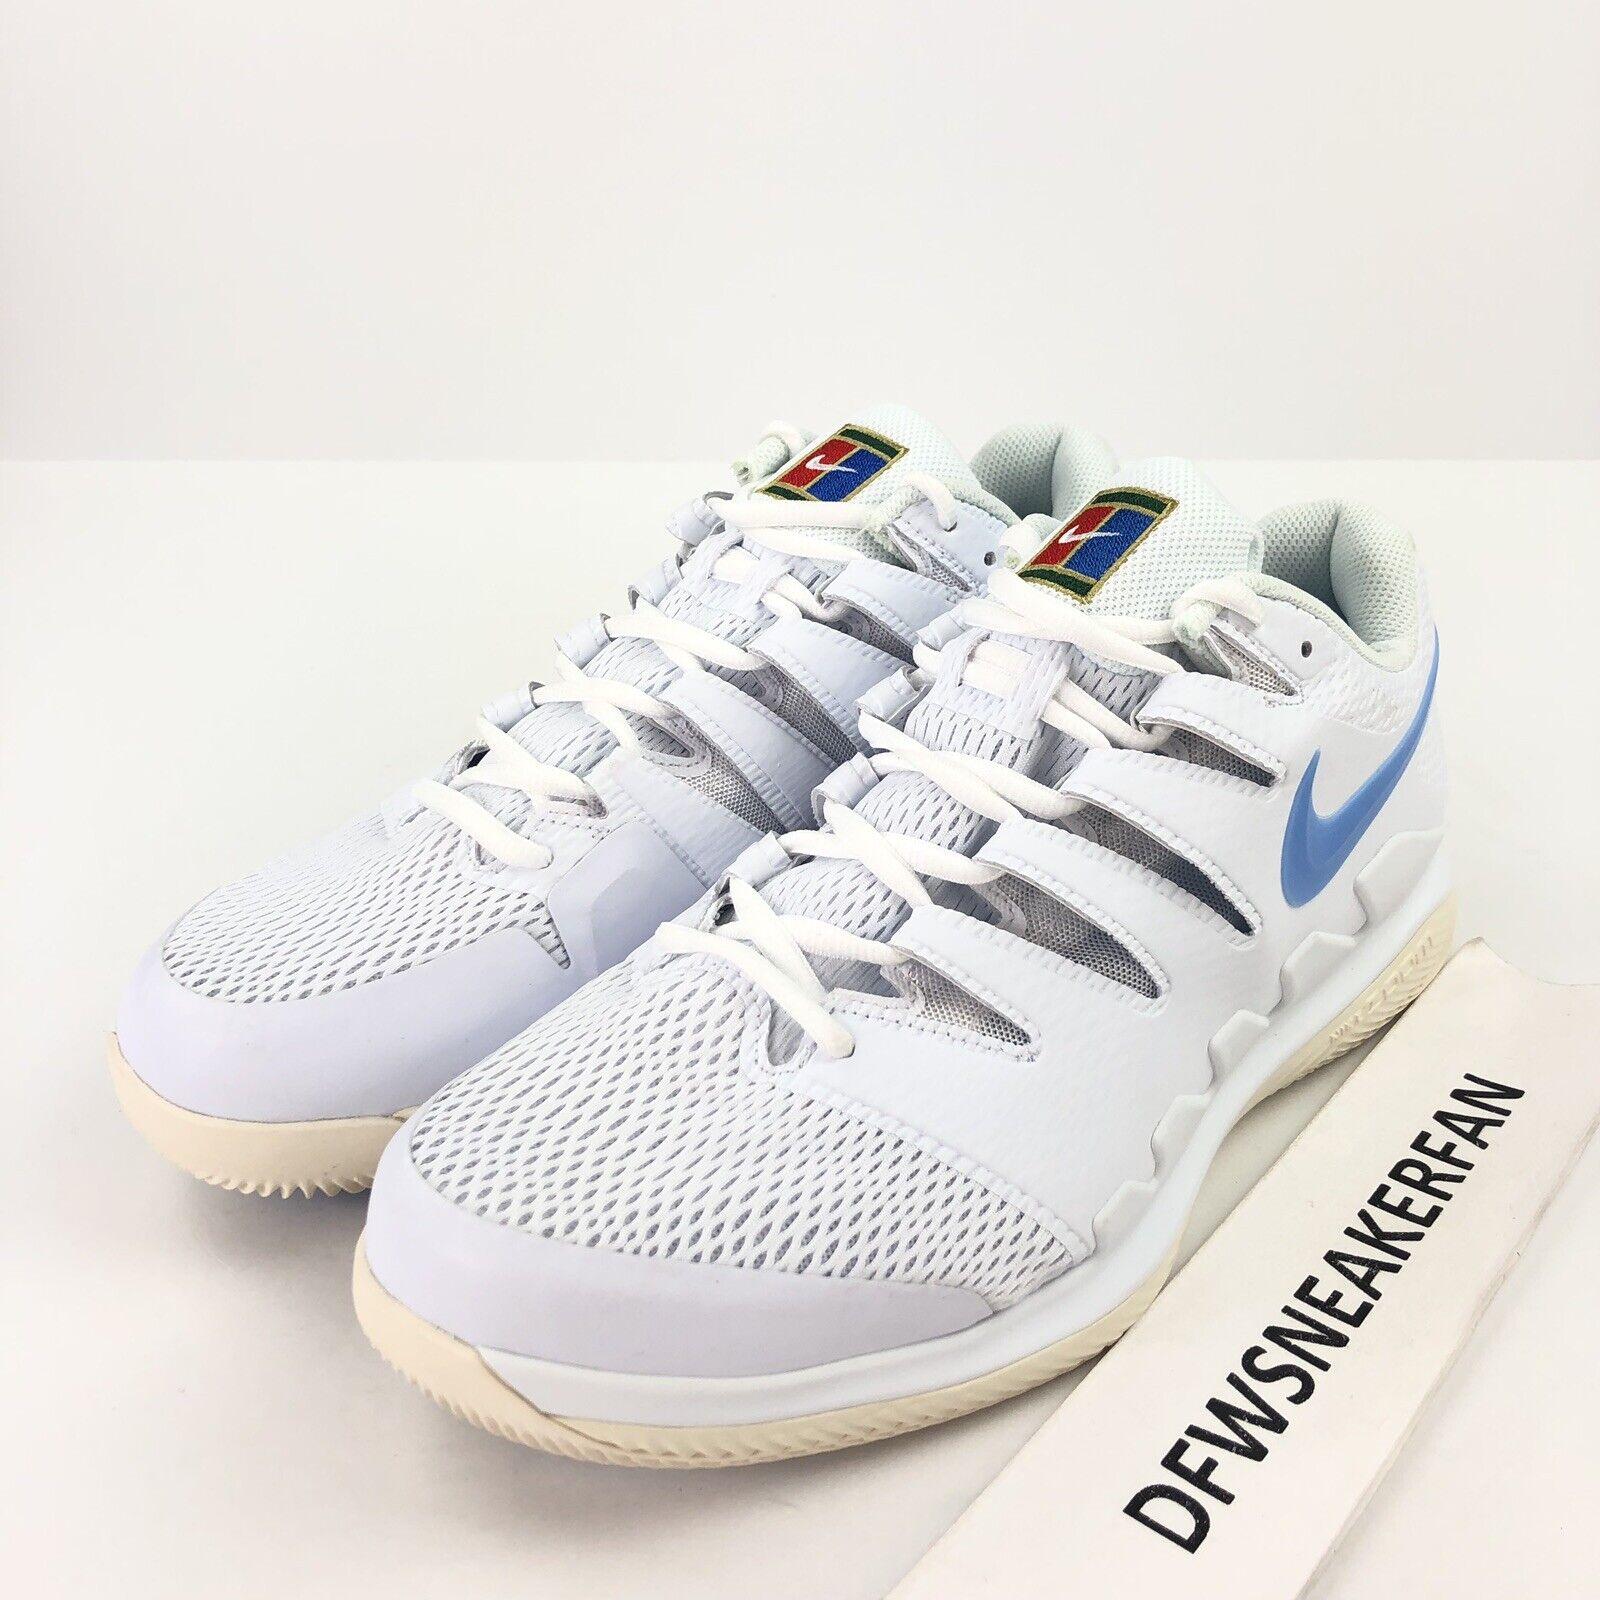 Nike Zoom Vapor X HC Men's 12.5 Wide Tennis shoes White bluee AH9066-100  Federer